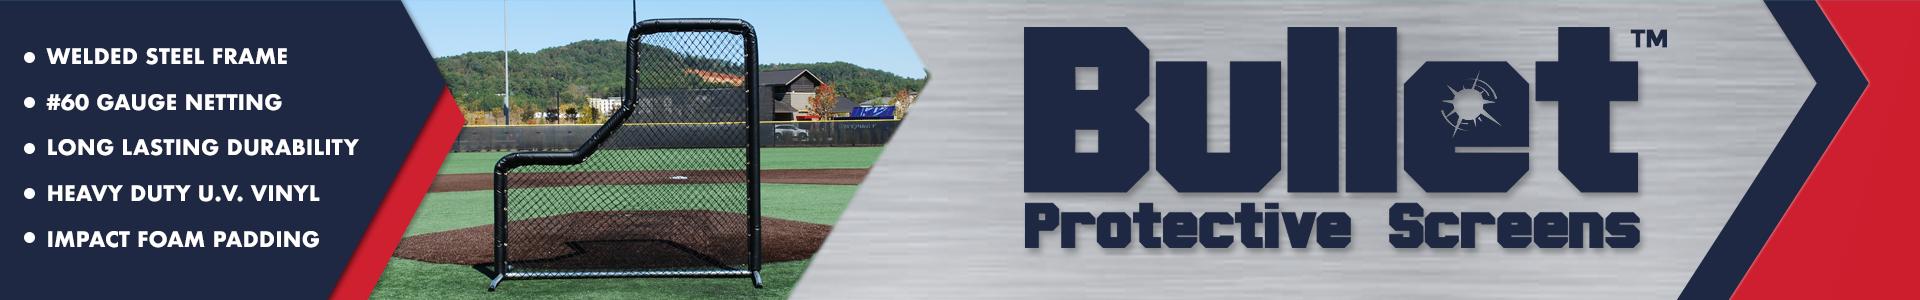 Baseball Bats, Gloves, Apparel, Equipment & More | Better